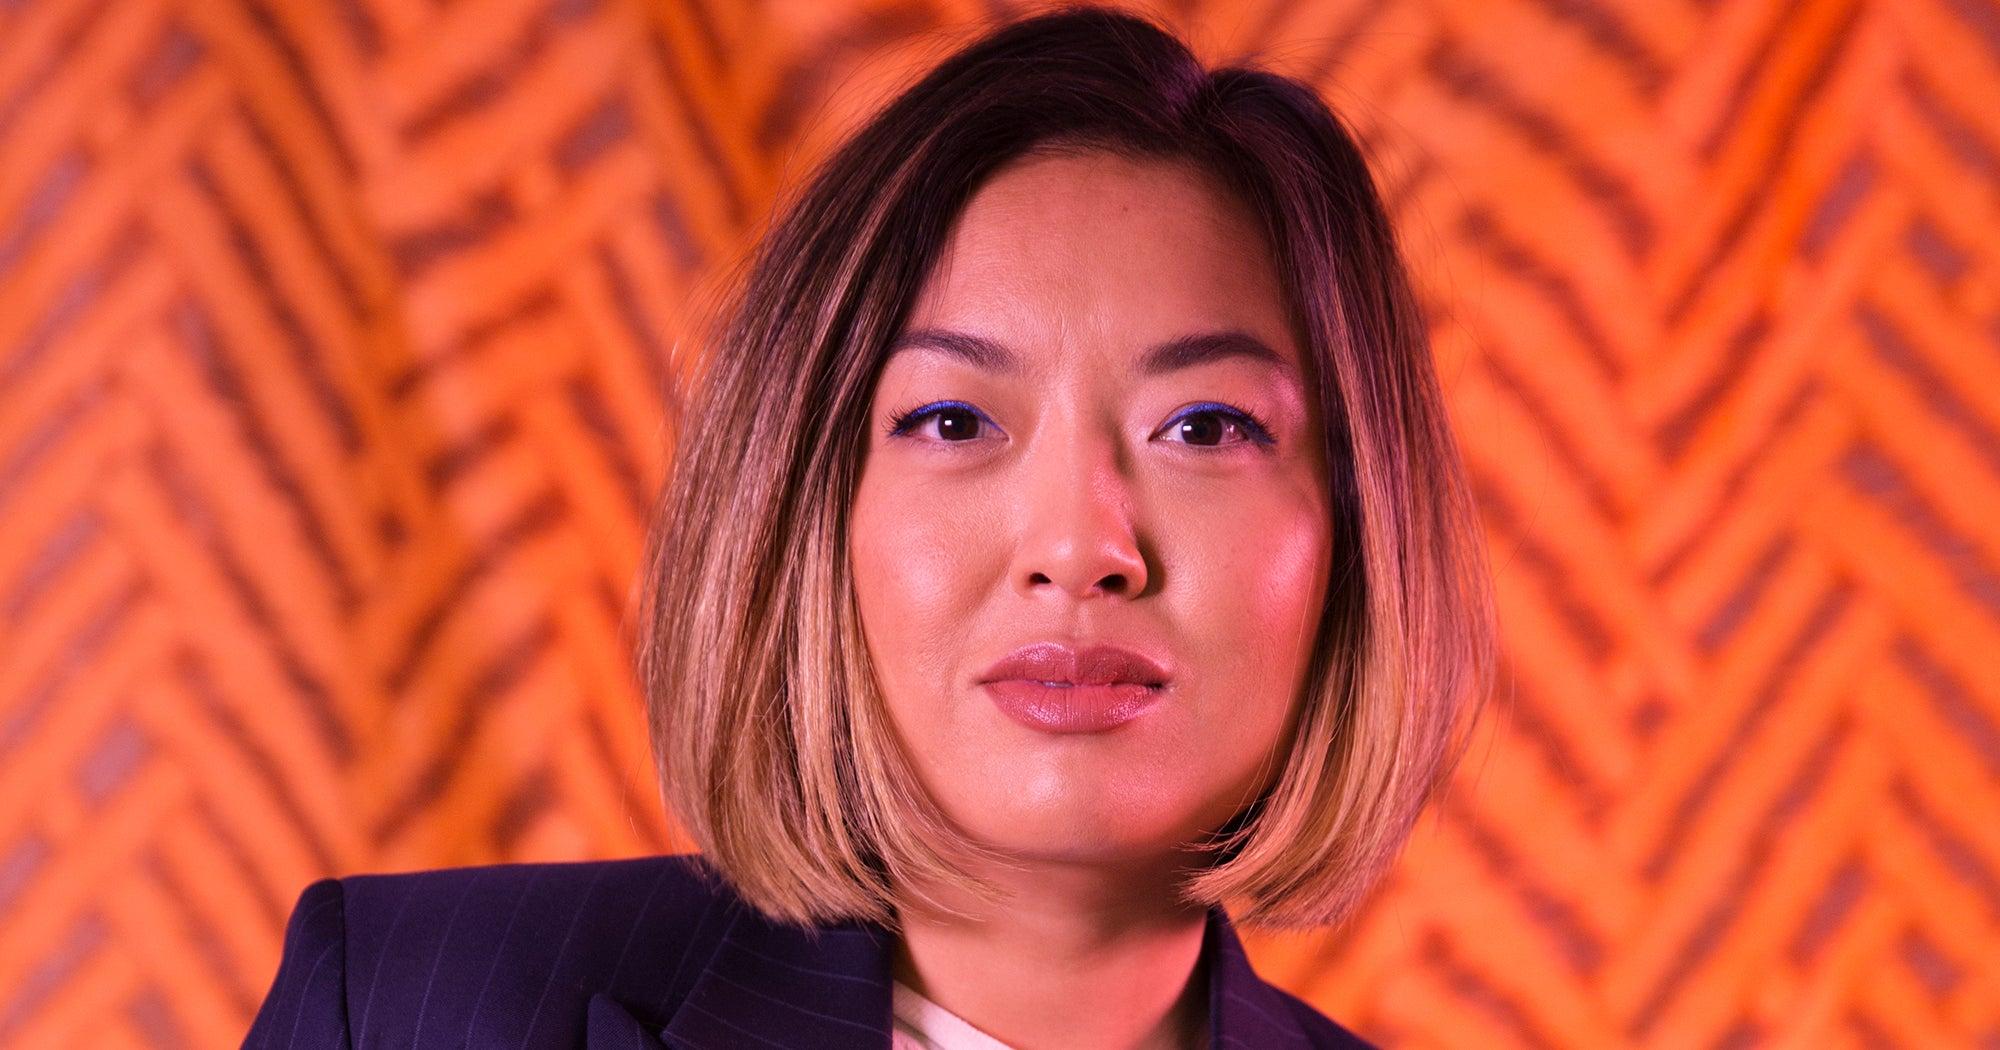 Birds Of Prey Director Cathy Yan Made A Girly Villain